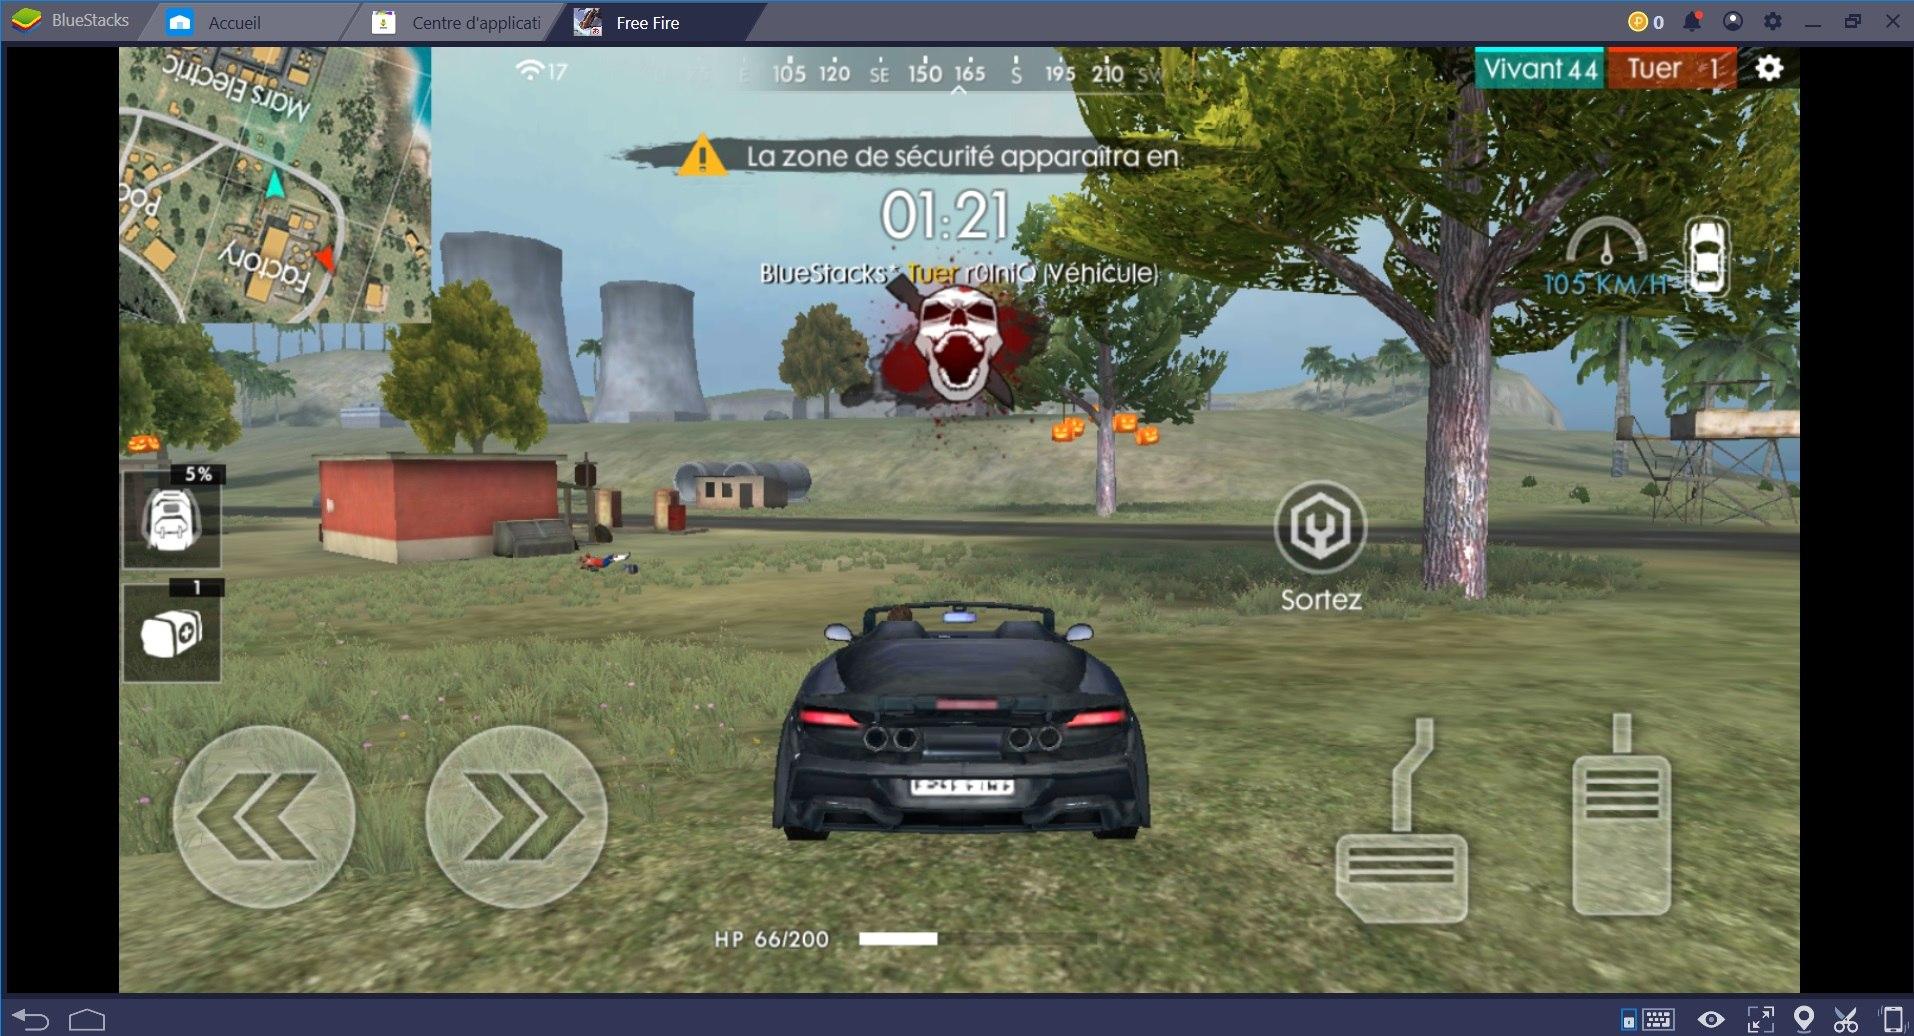 Free Fire Battlegrounds : Fraguez plus grâce au Combo Key de BlueStacks